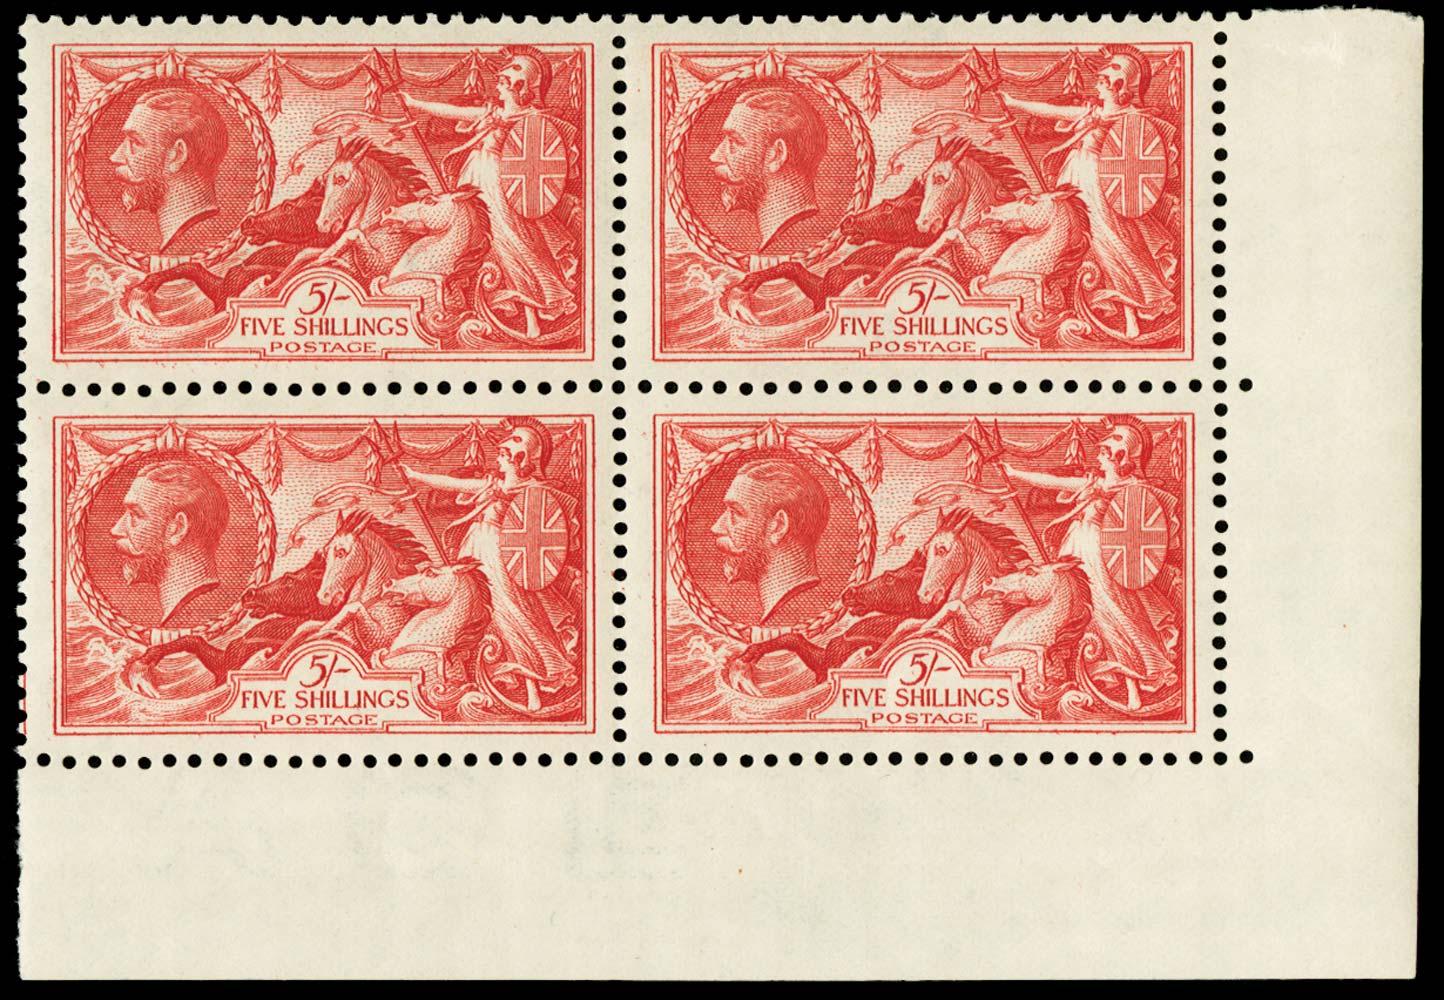 GB 1934  SG451 Mint corner marginal block of four